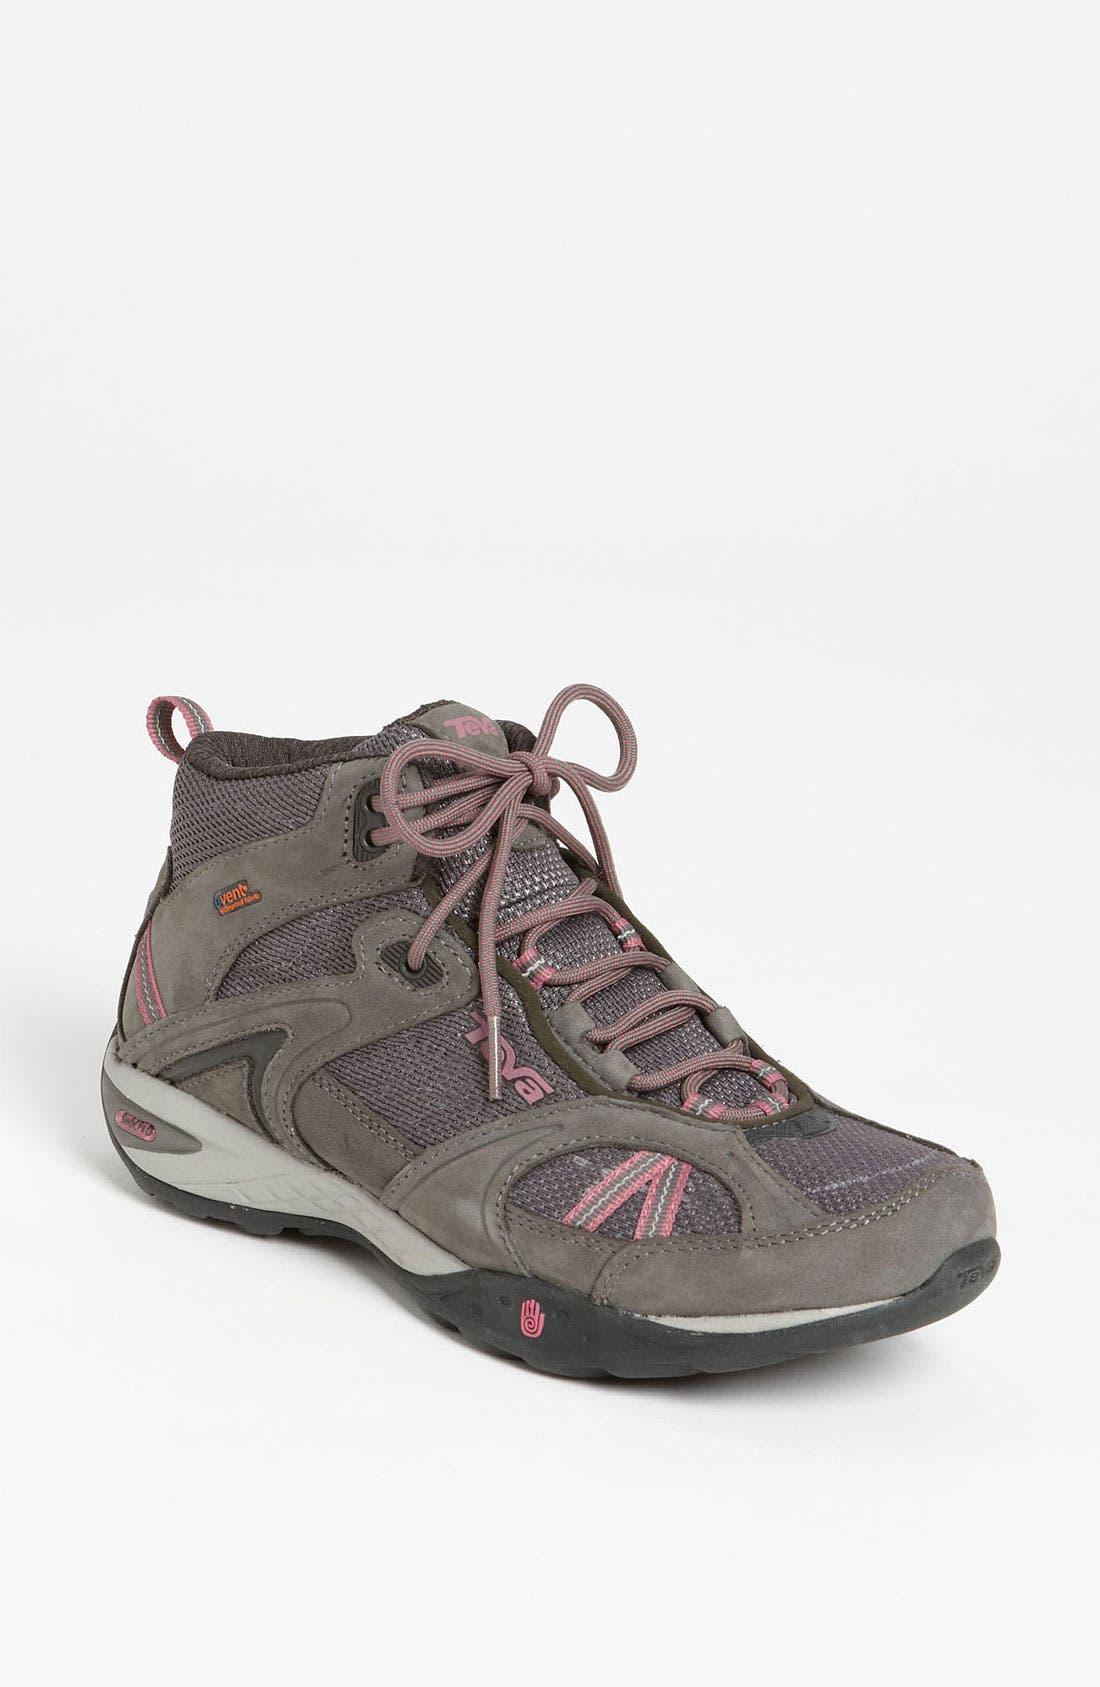 Main Image - Teva 'Sky Lake Mid eVent®' Hiking Boot (Women)